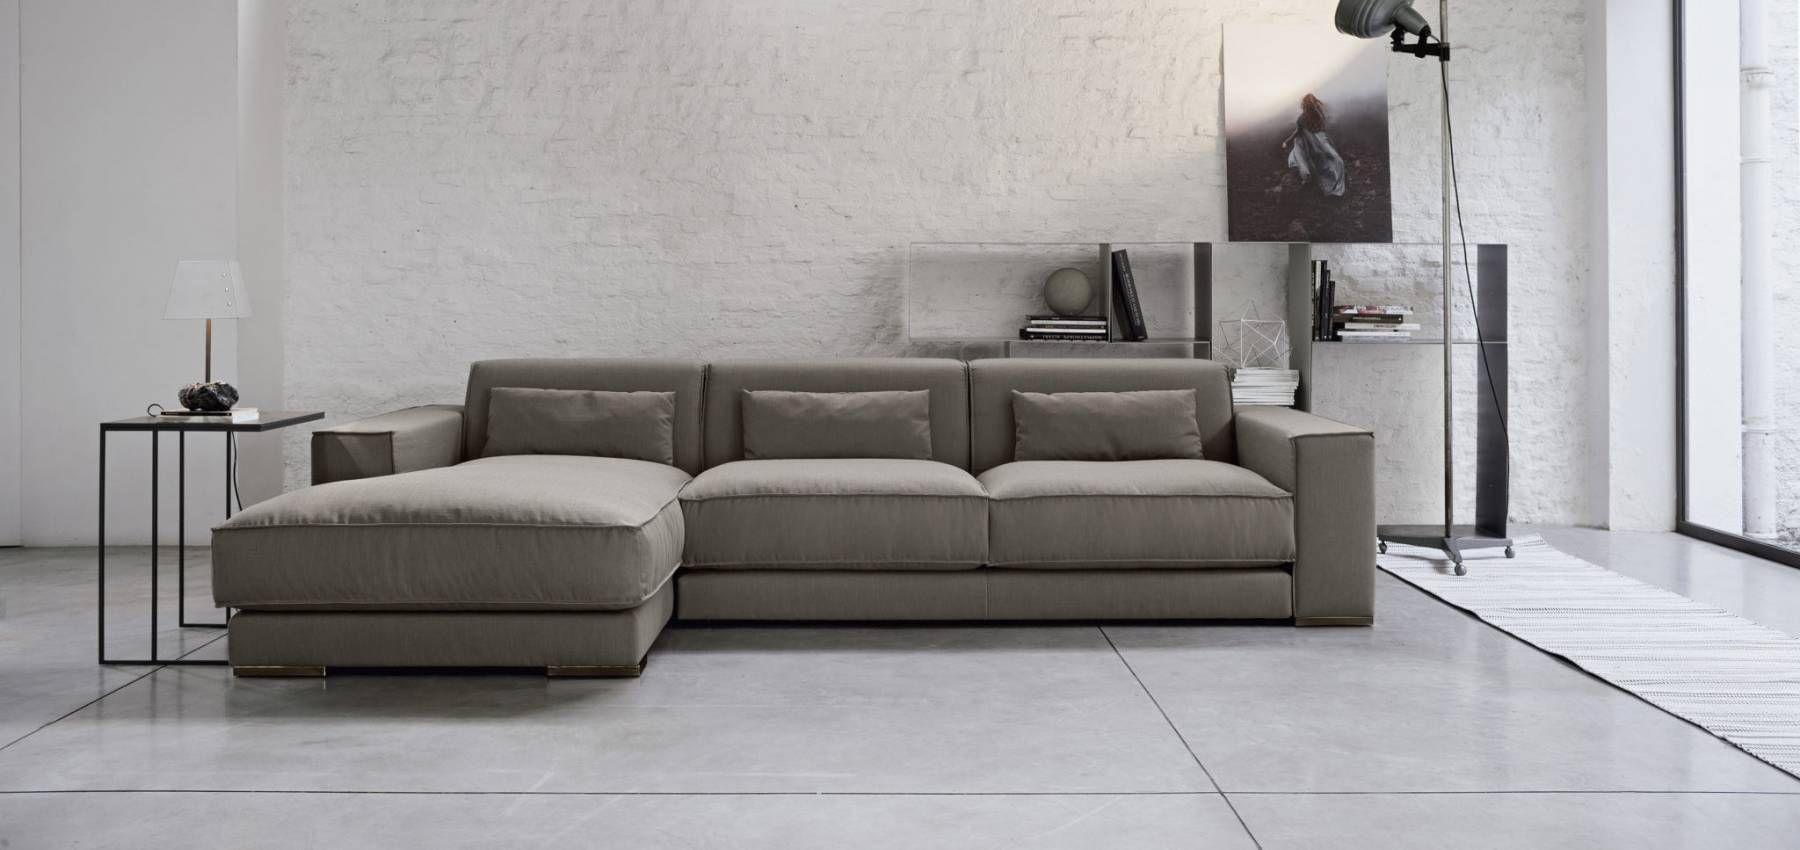 Steven Doimo Salotti Comfortable Seat Cushions Divano